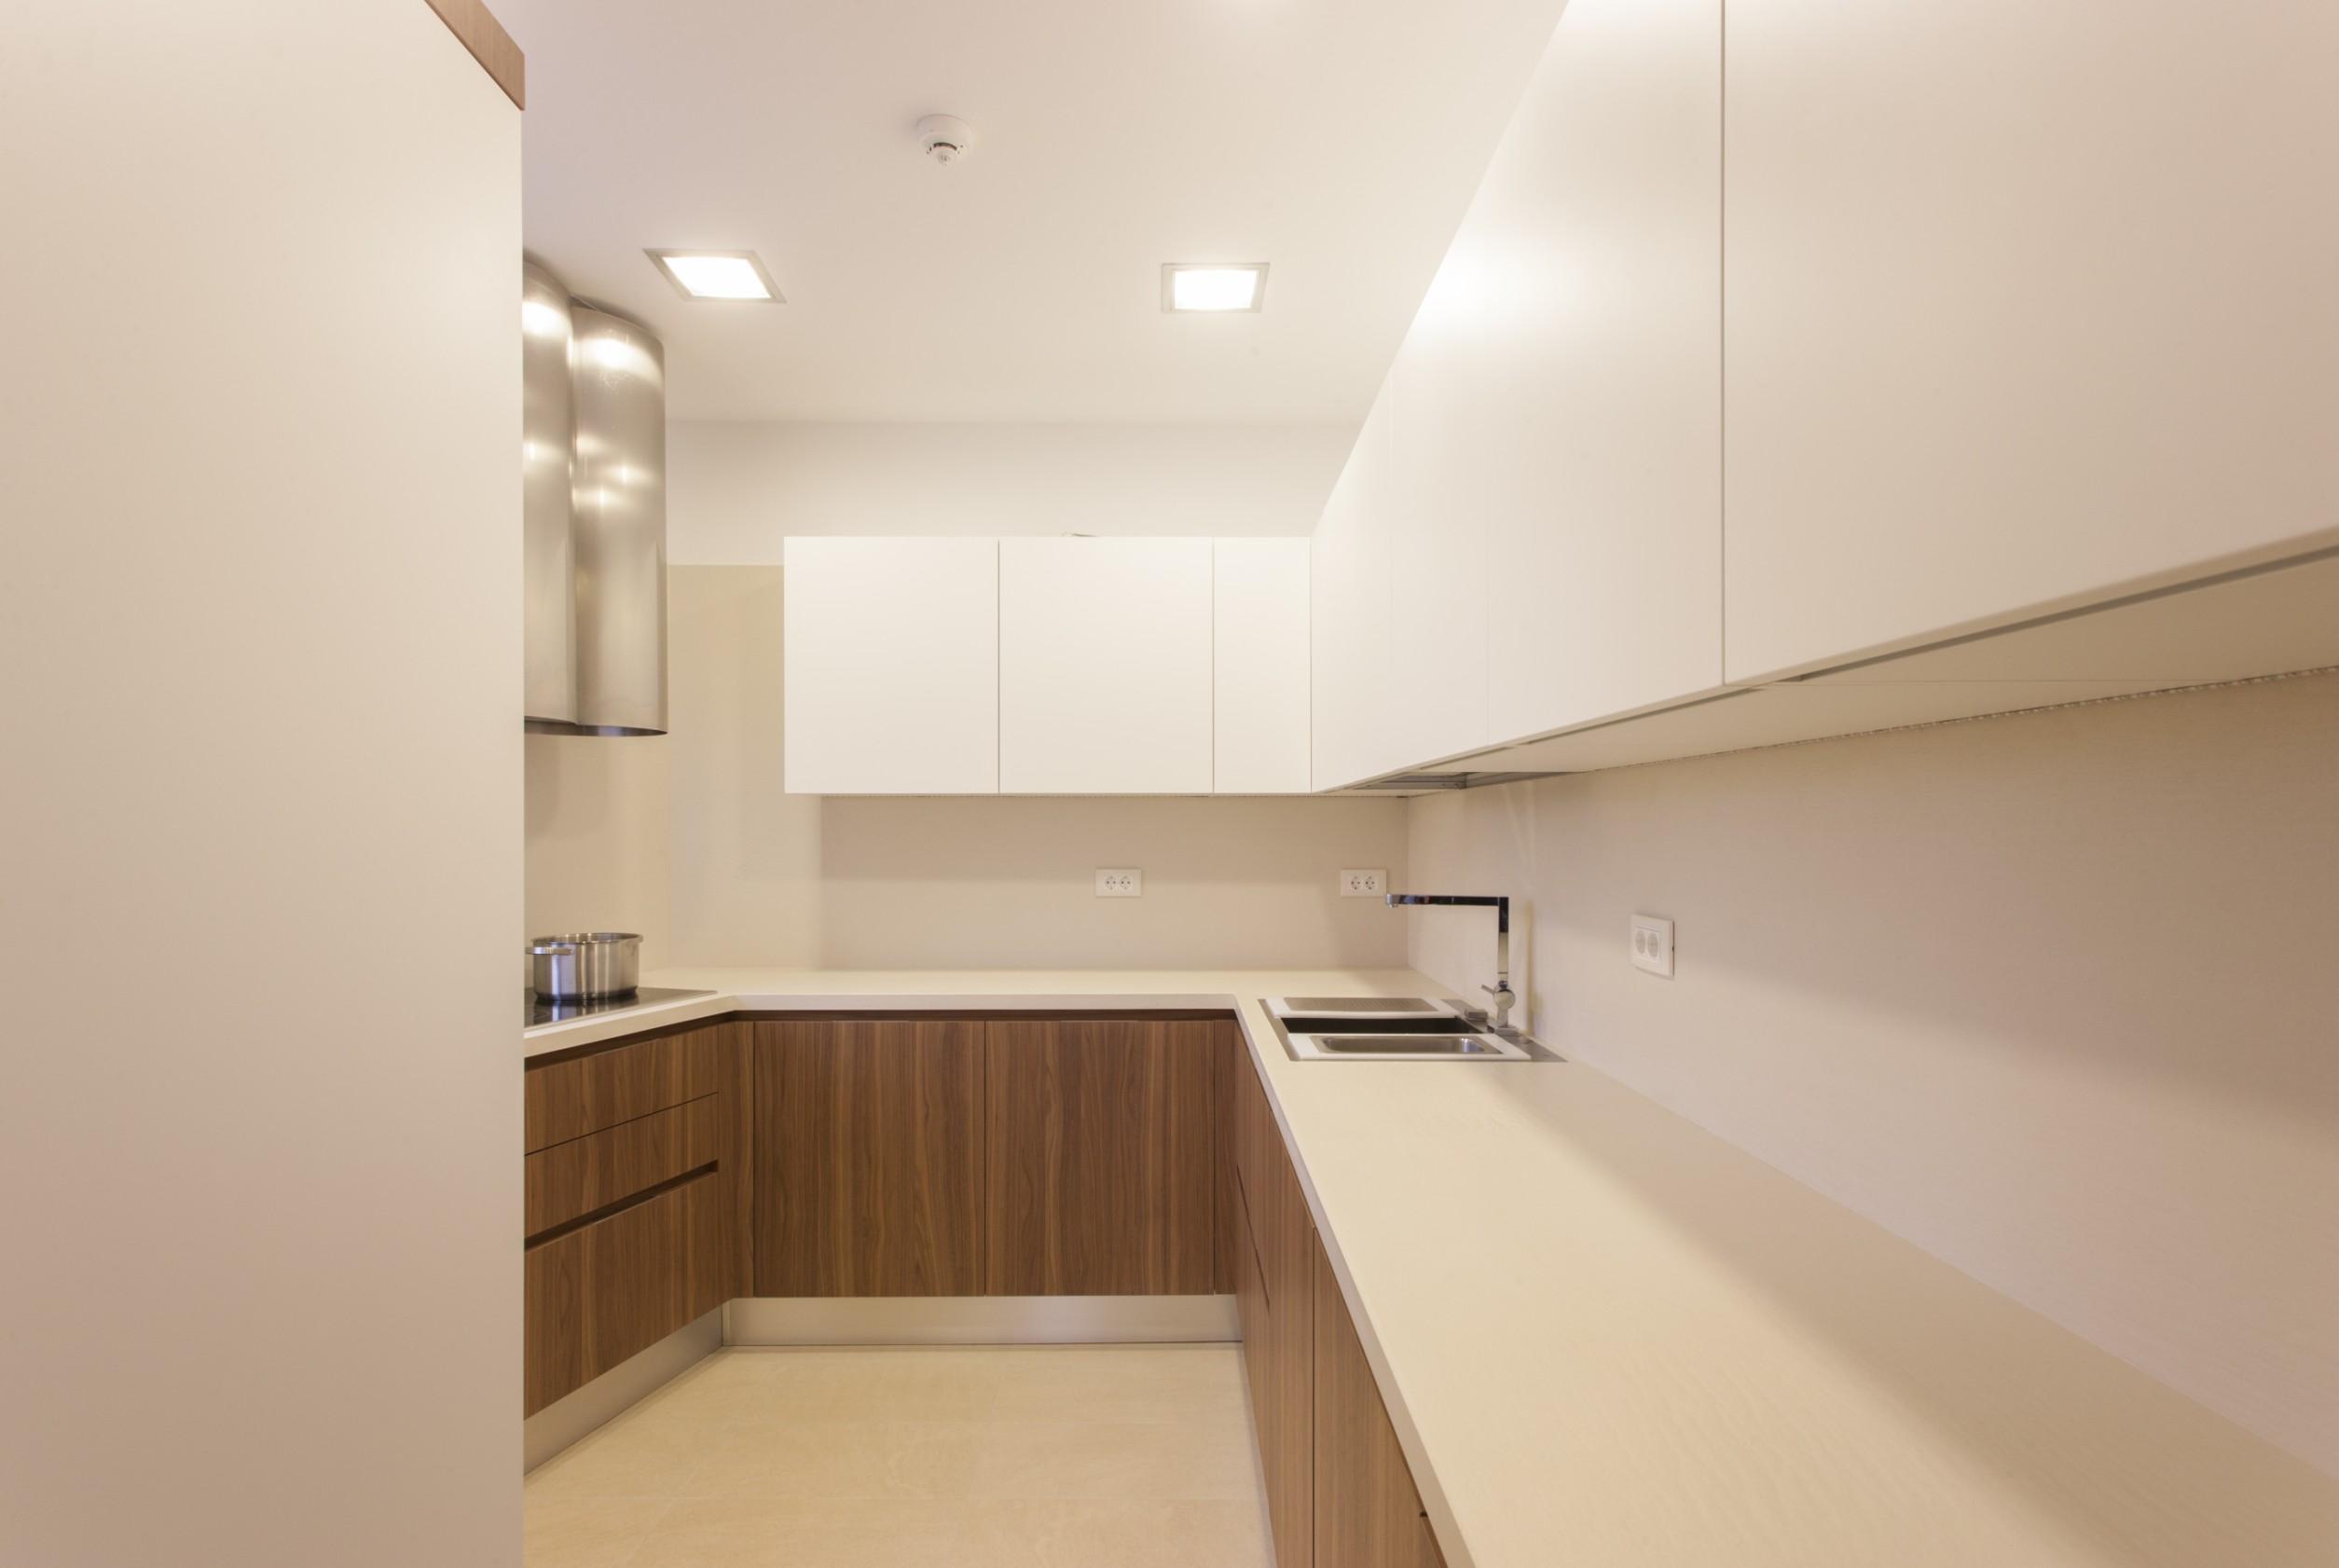 https://nbc-arhitect.ro/wp-content/uploads/2020/10/NBC-Arhitect-_-Petofi-Sandor-_-Housing-_-interior-design-_-kitchen_1.jpg